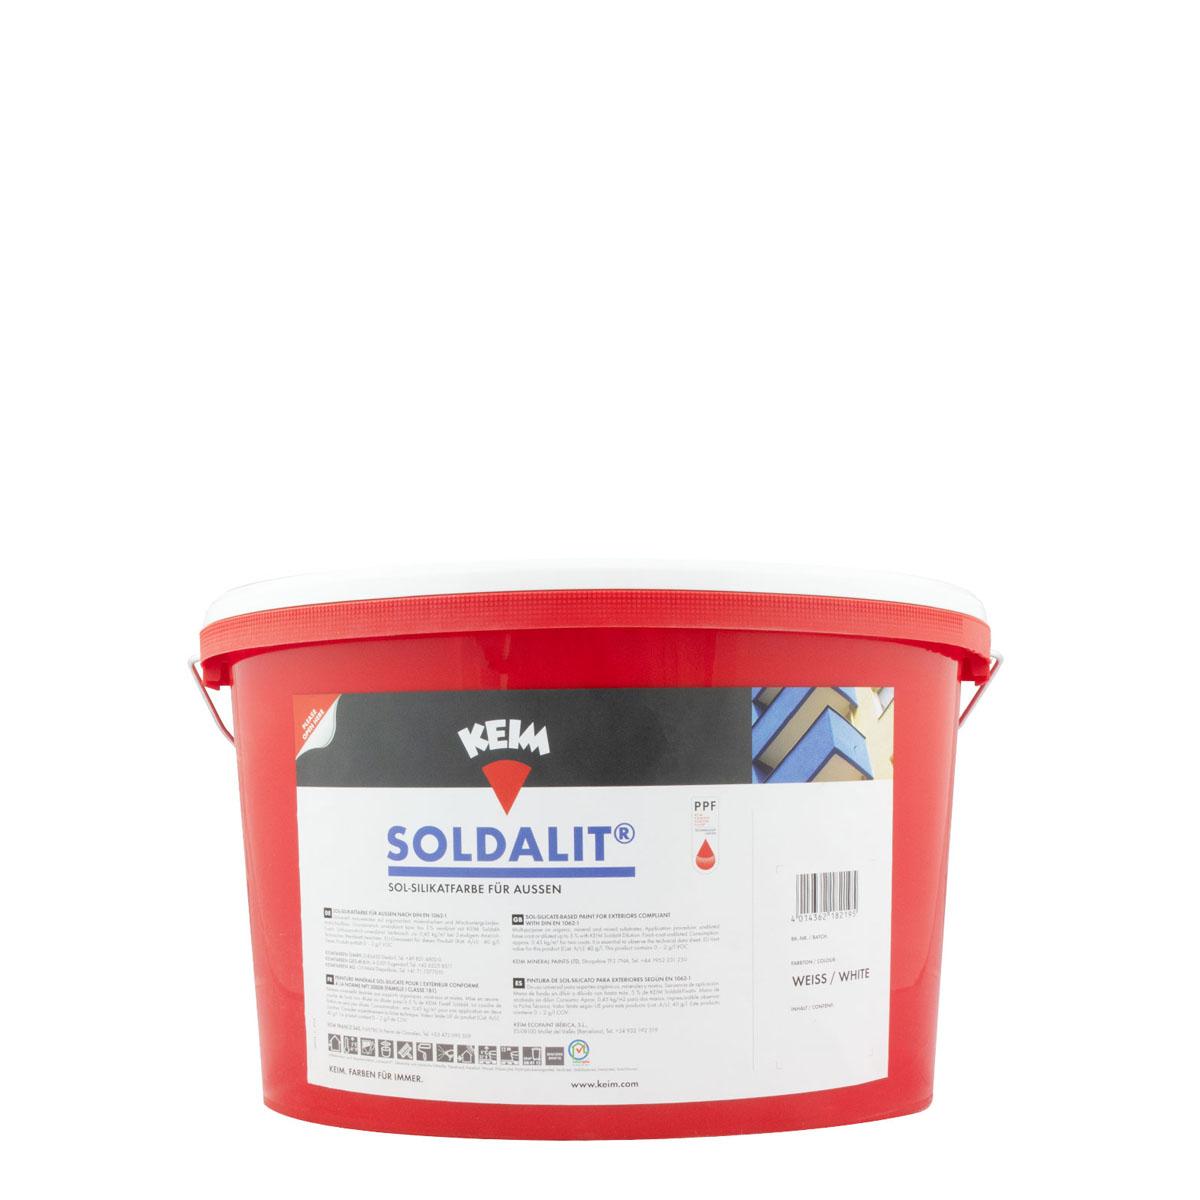 Keim Soldalit Fassadenfarbe 5kg weiss, silikatbasis